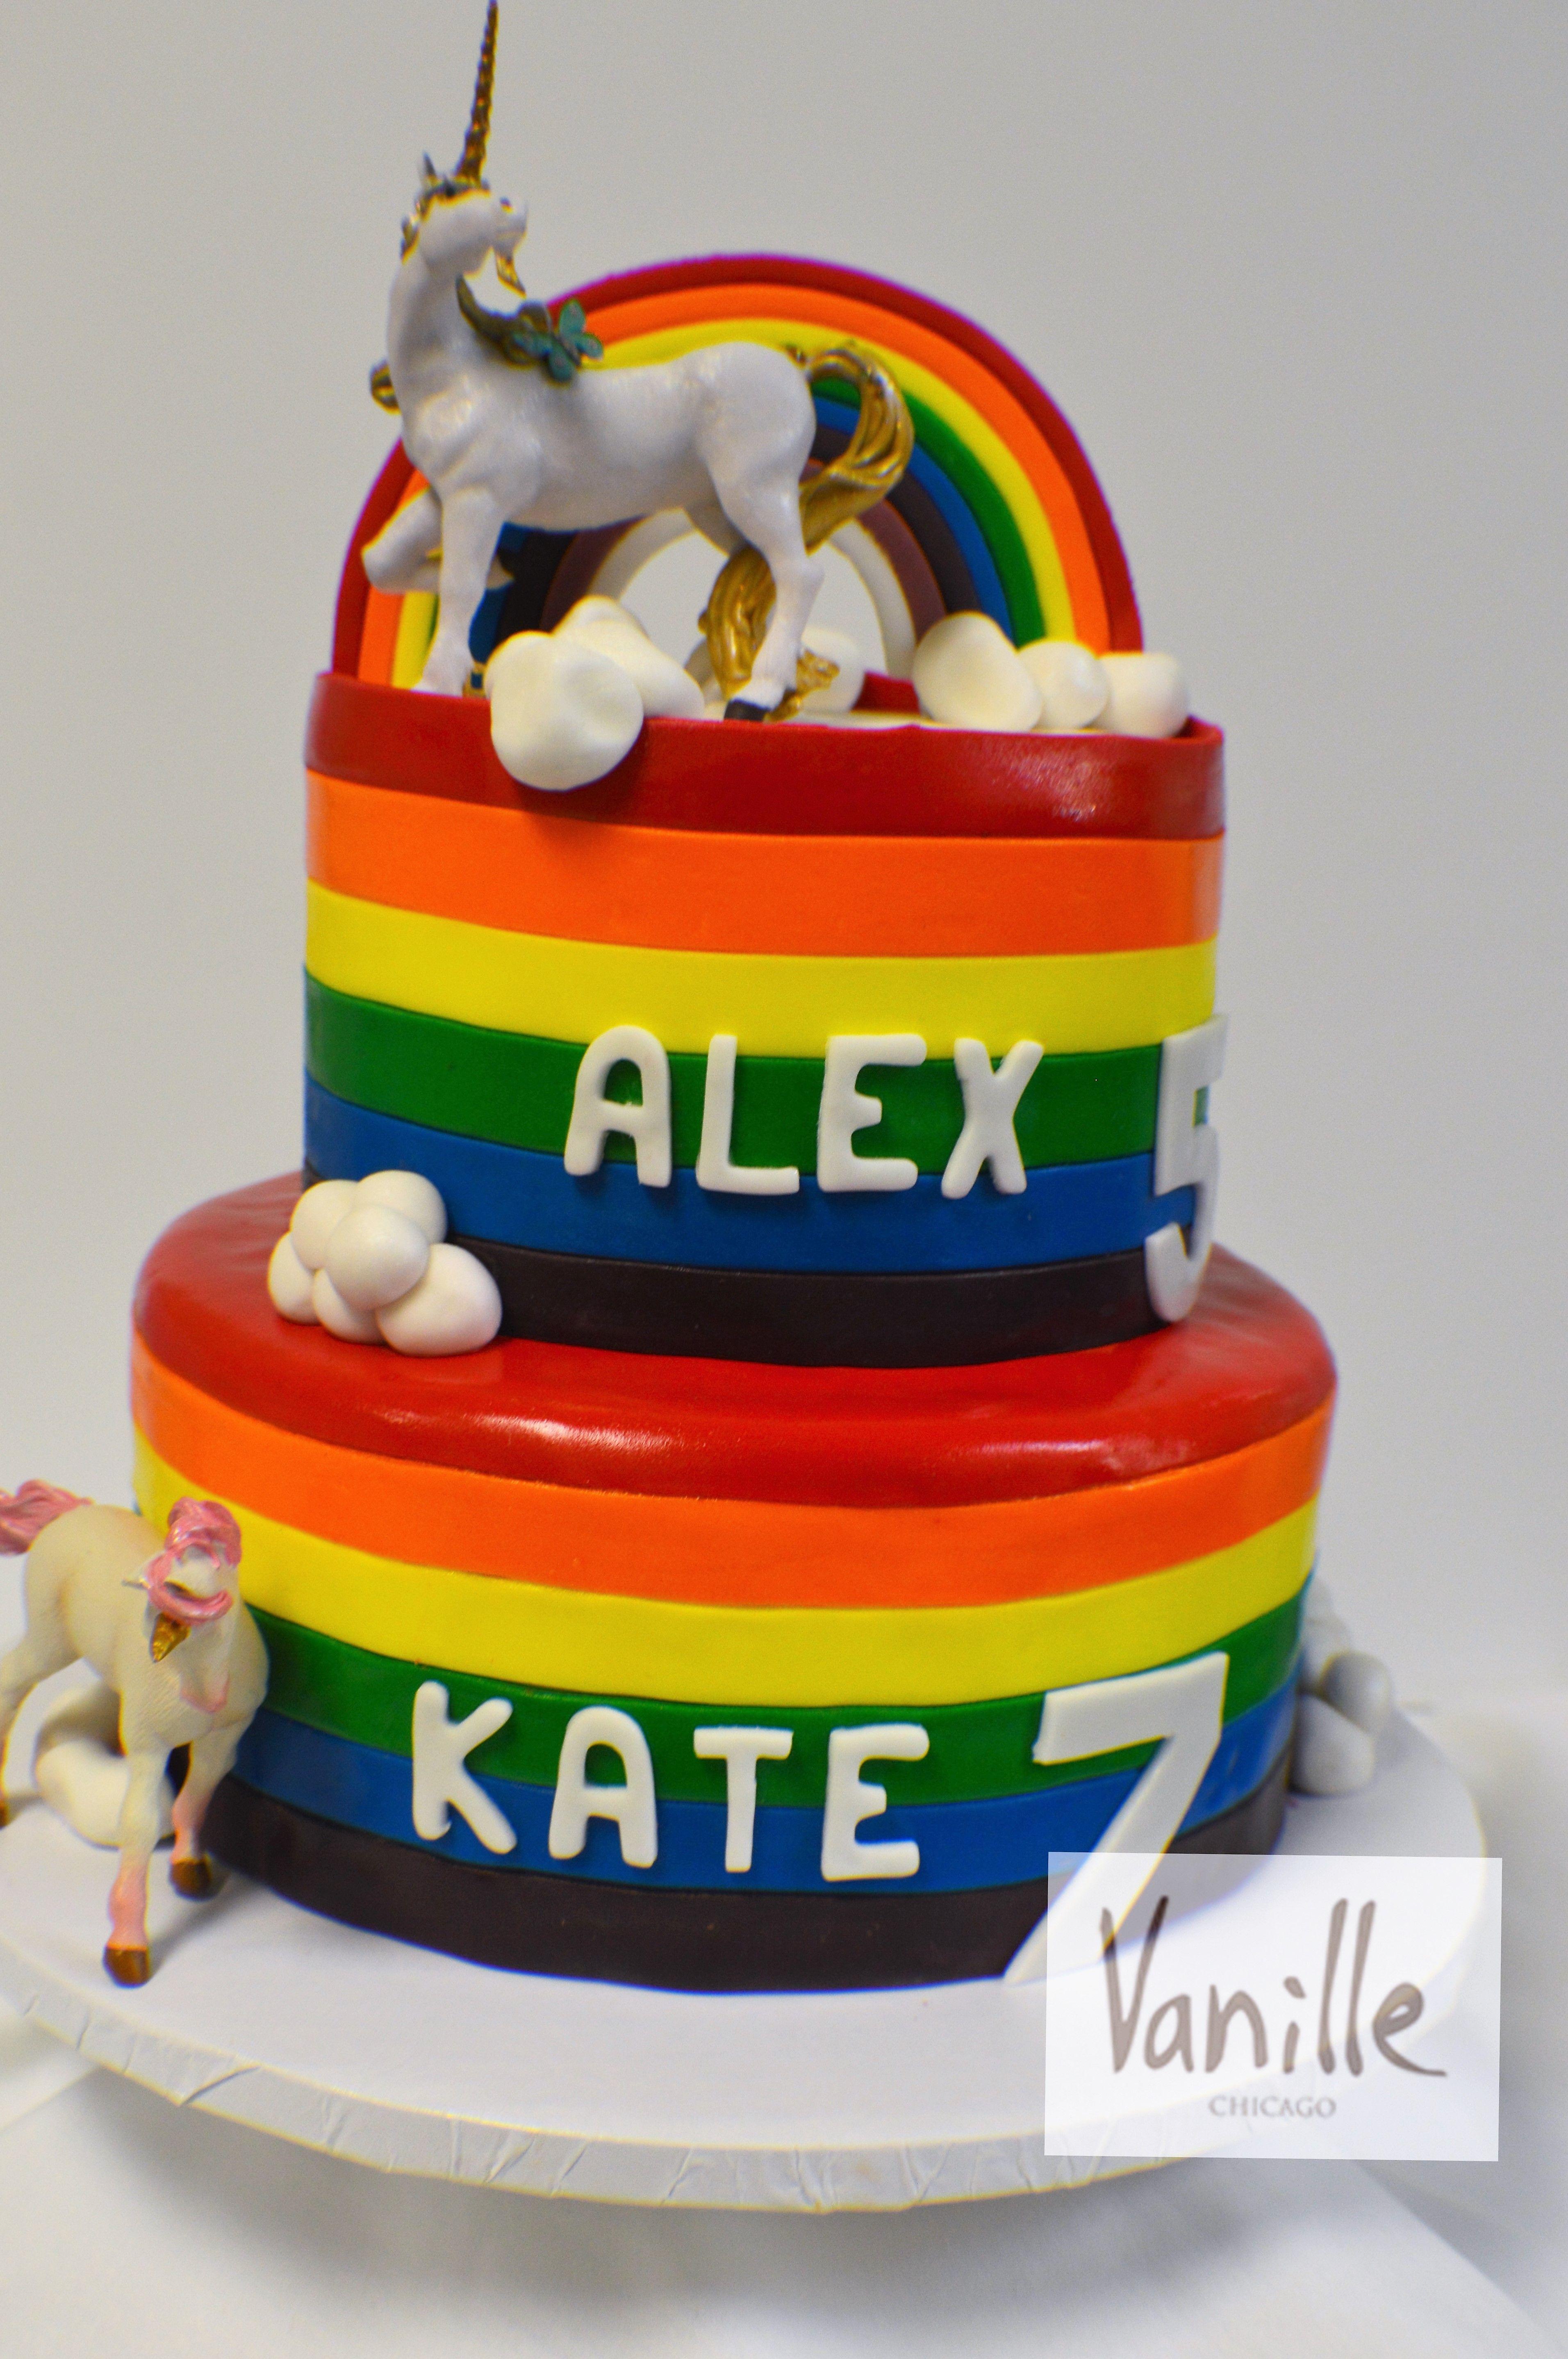 vanille chicago rainbow and unicorn birthday cake vck71 judah s on minnie mouse birthday cakes chicago